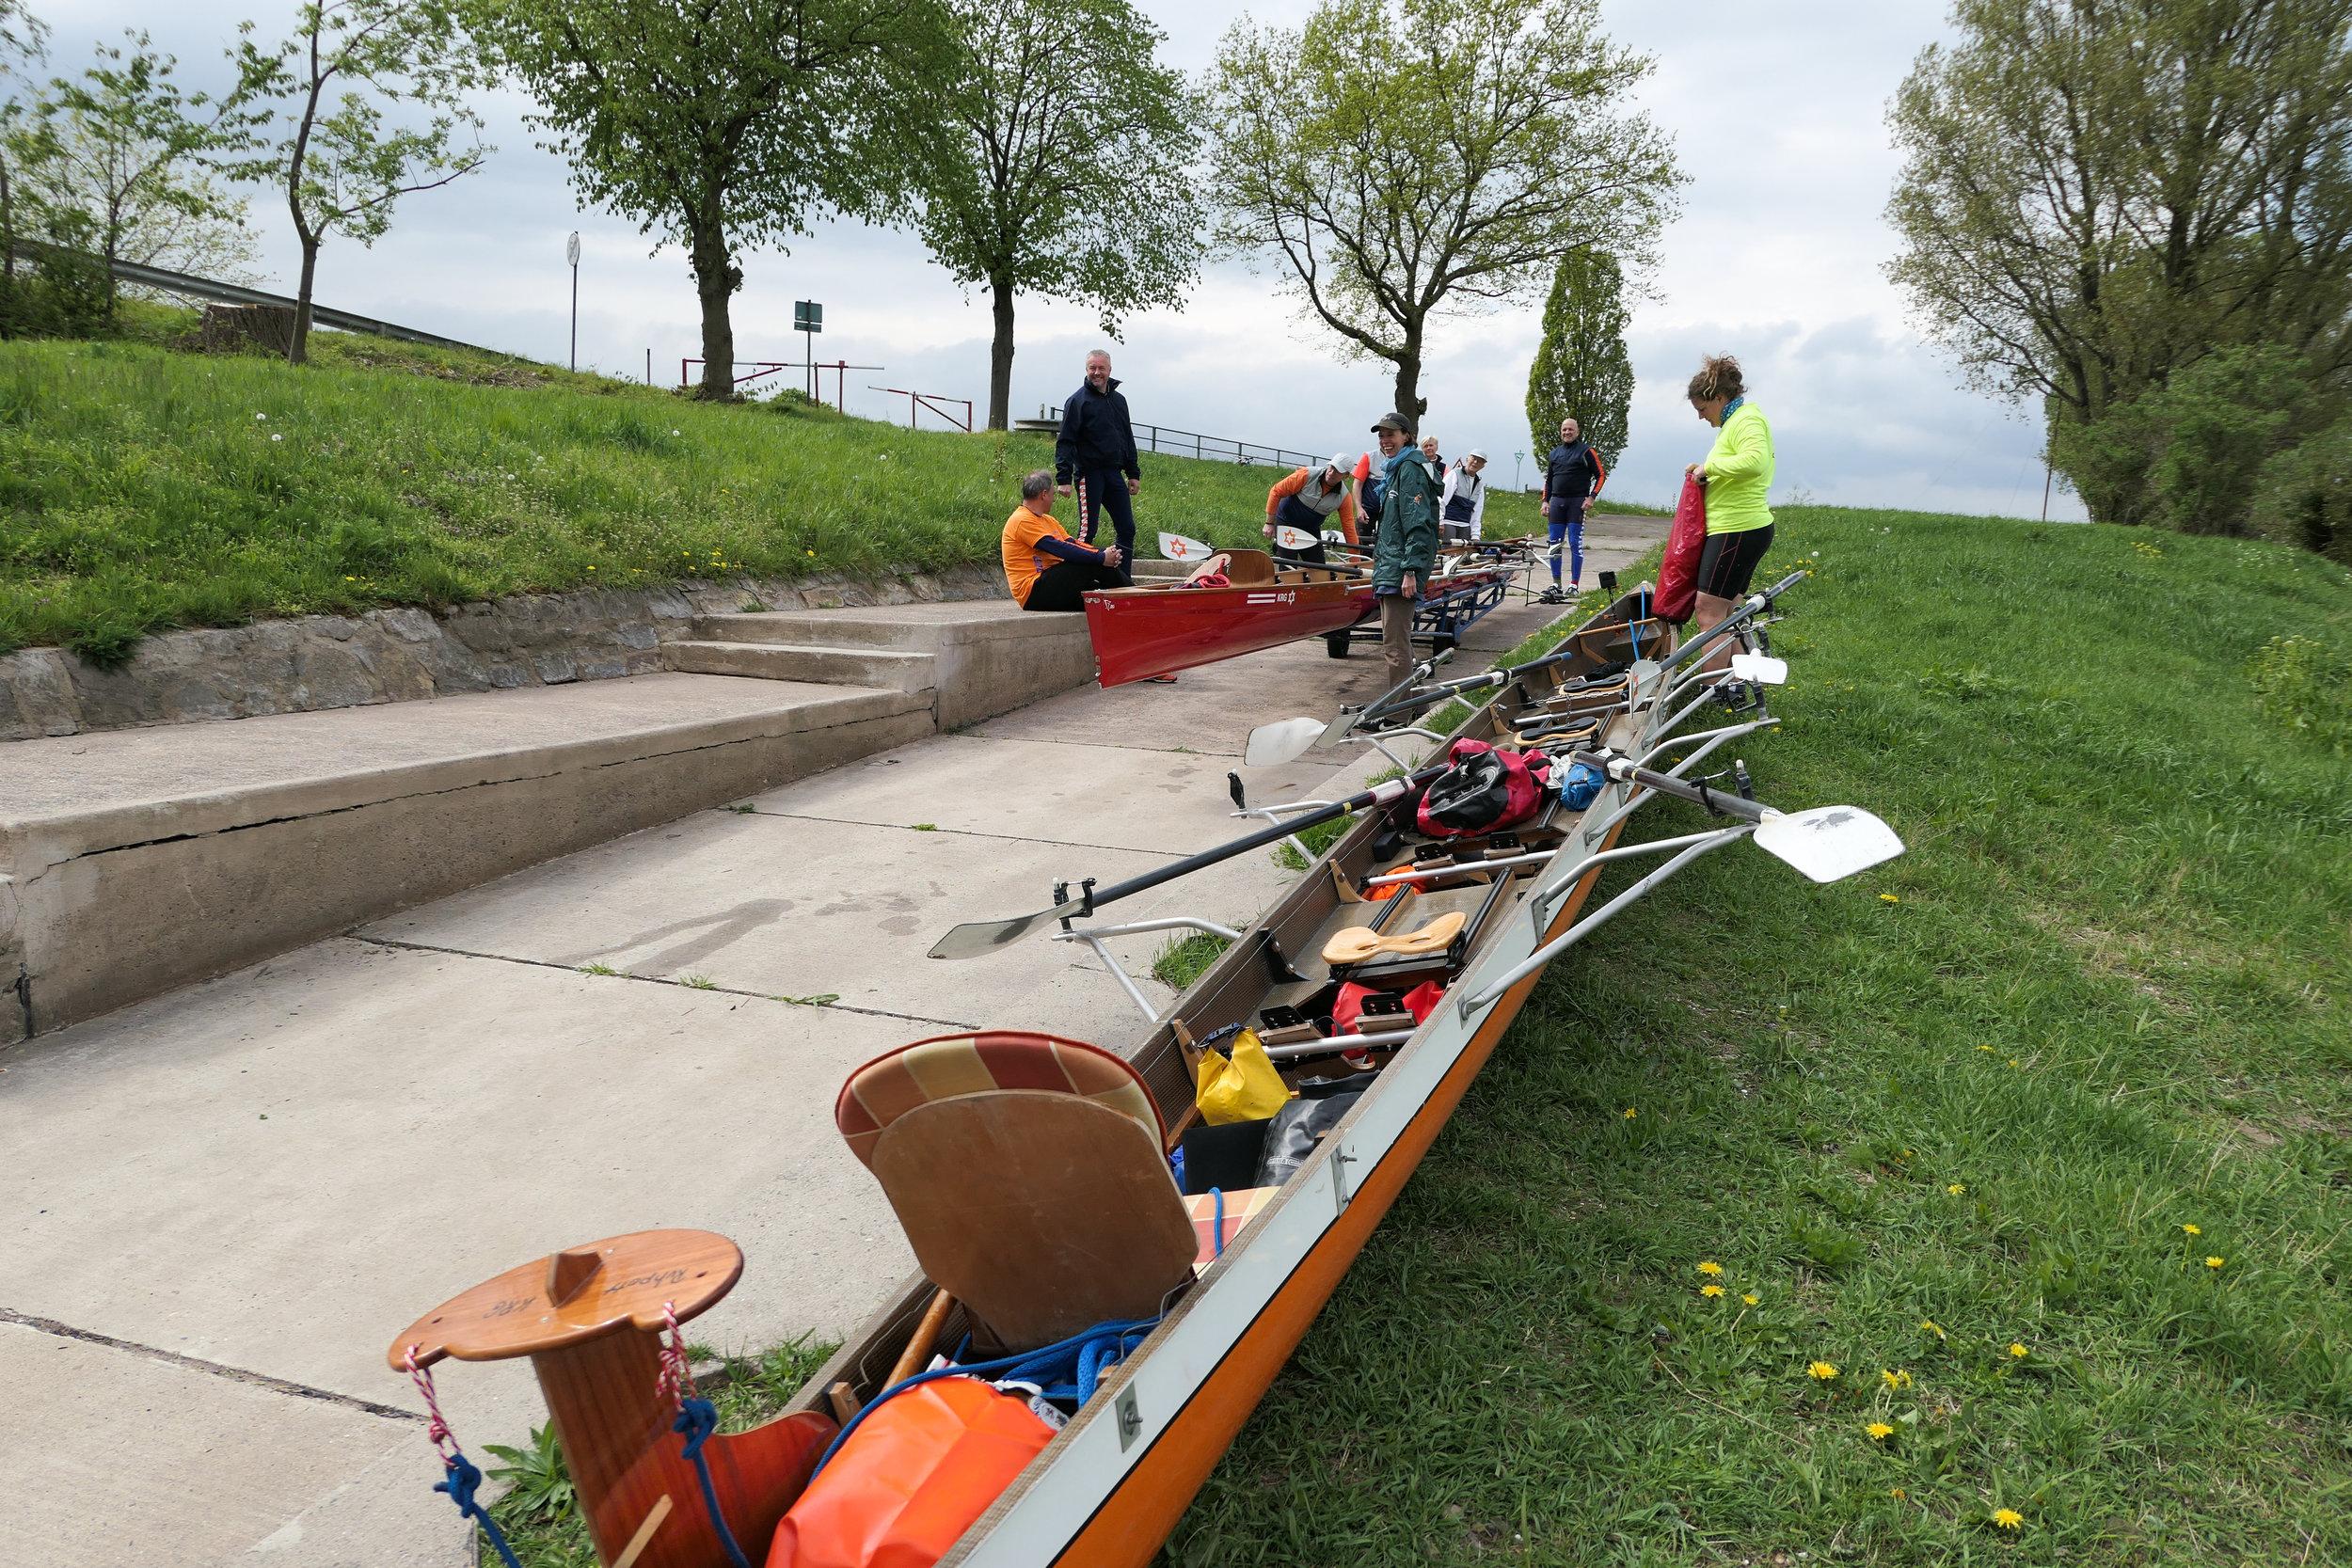 maiwanderfahrt-weser-2019-2_0074_2019-04-28_14-18-28.jpg